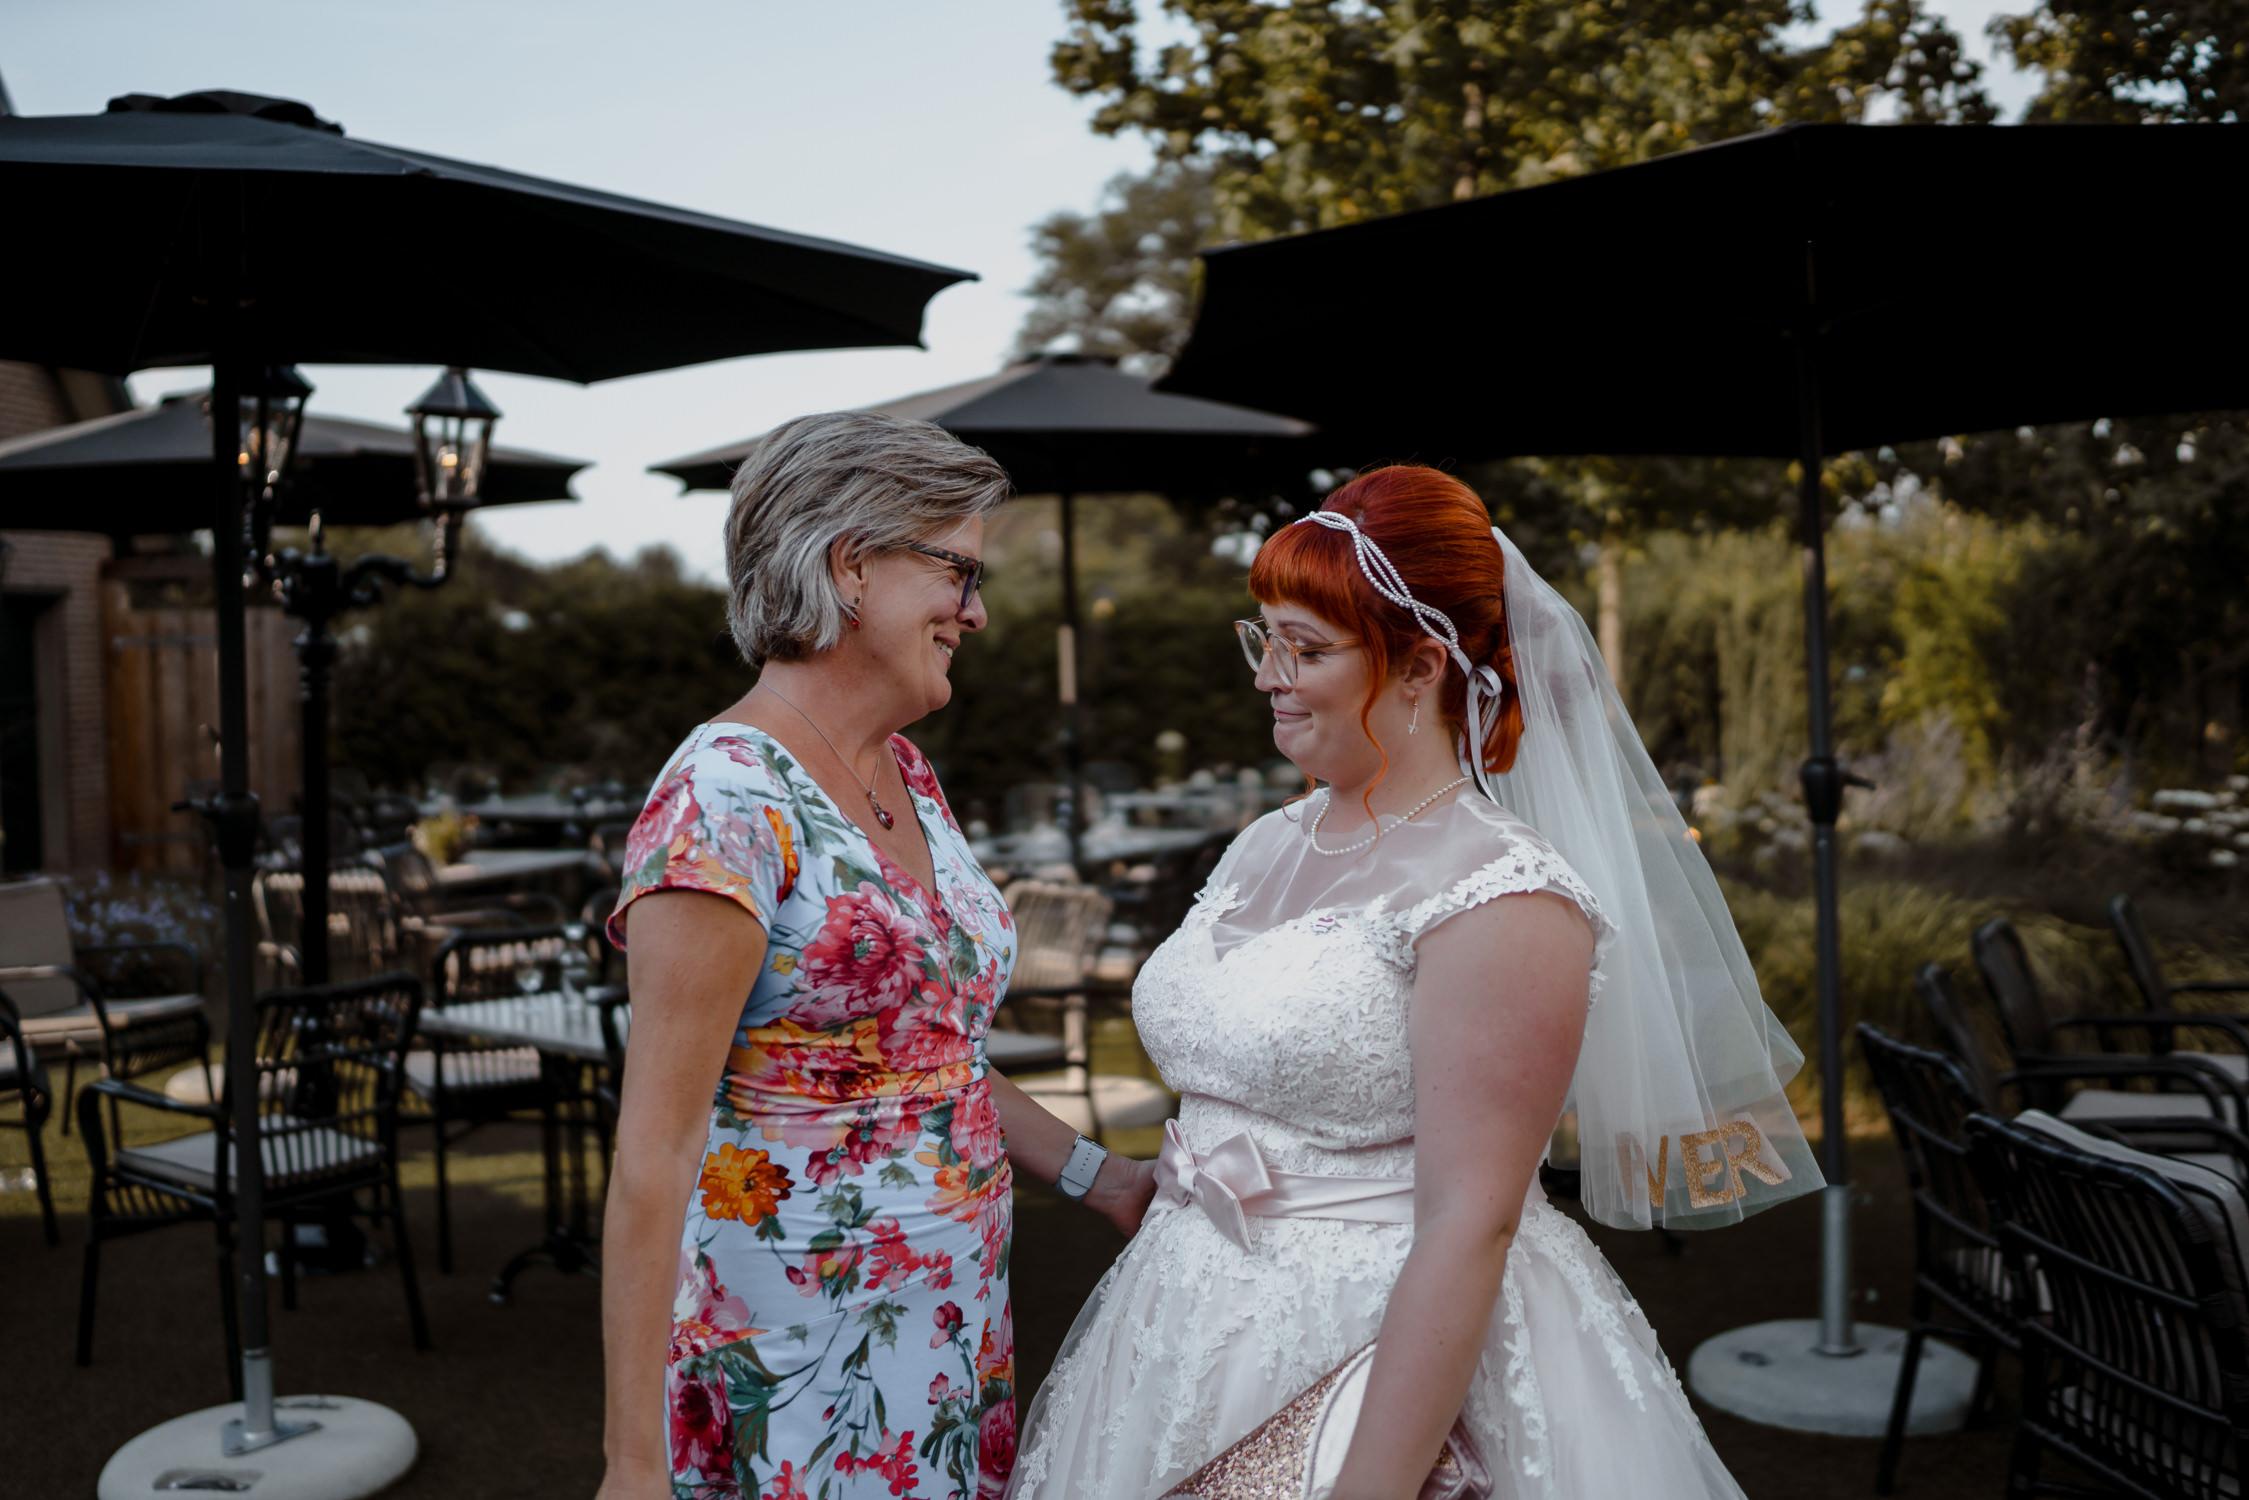 amsterdam-wedding-photographer-bruidsfotografie-trouwfotograaf-mark-hadden-Lucie-Luuk-320.jpg